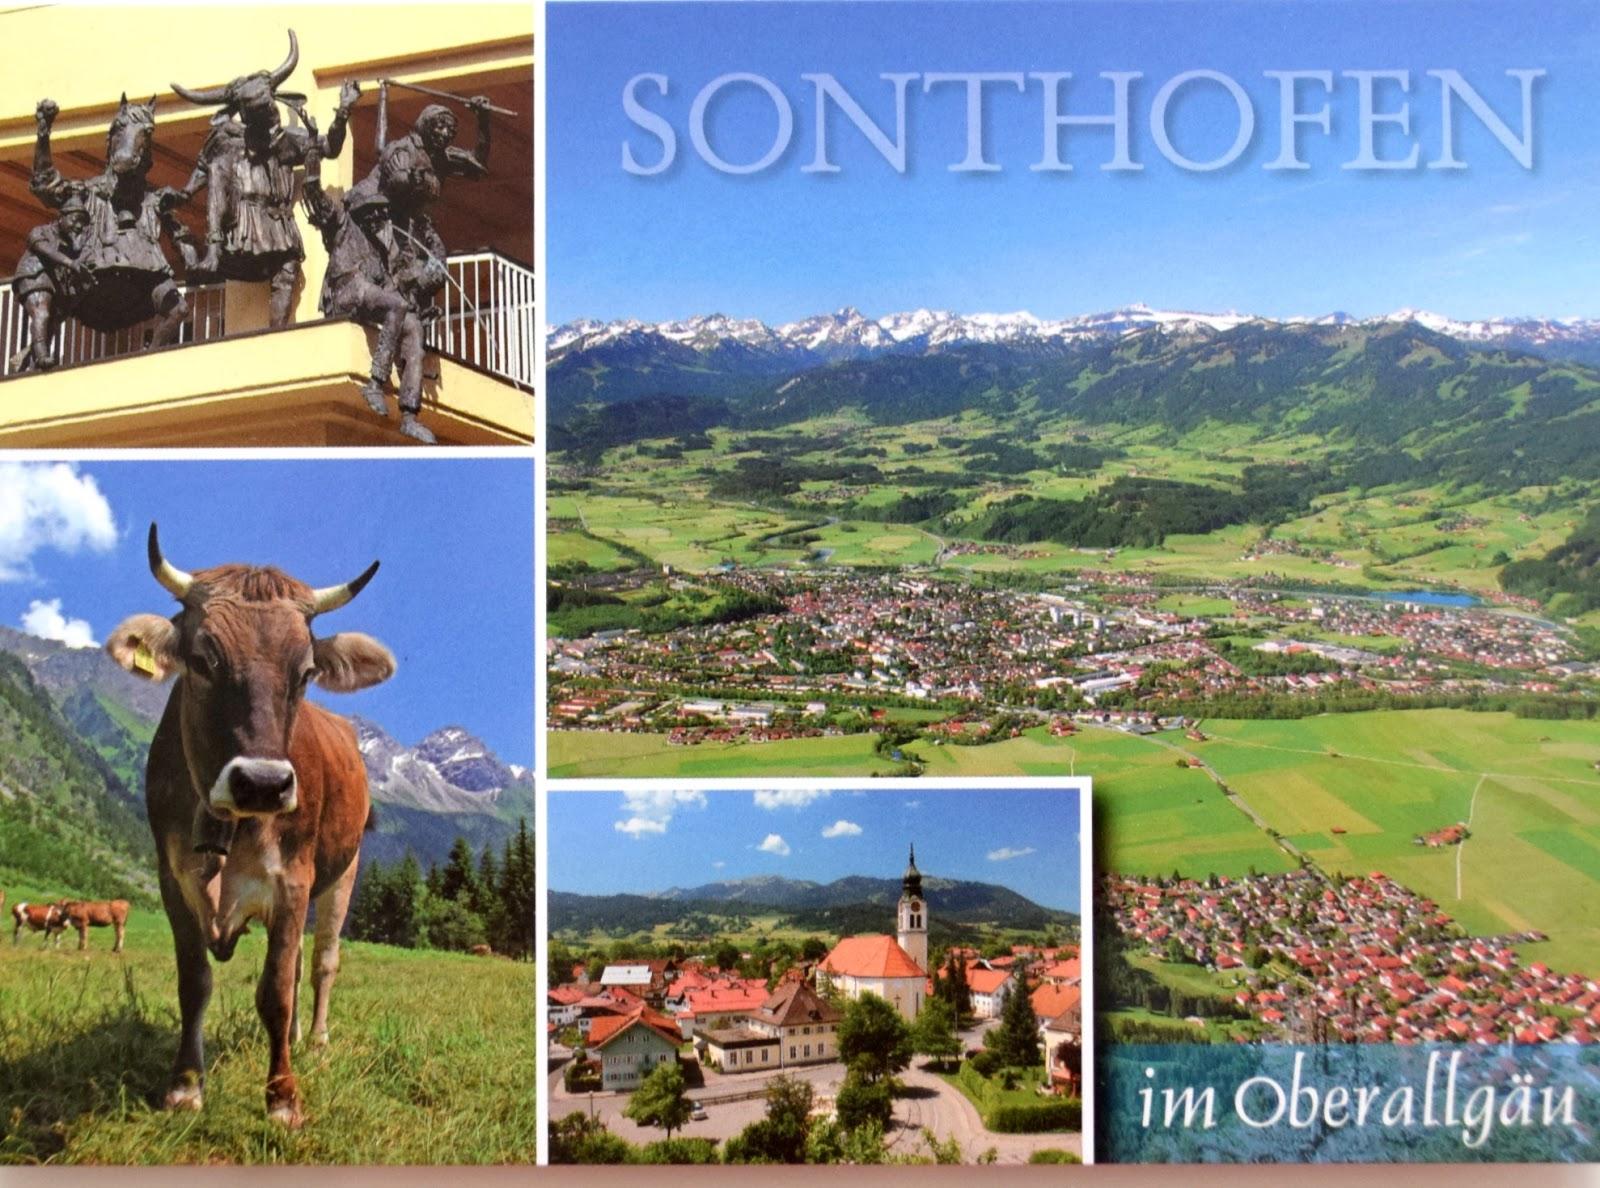 Sonthofen, Germany